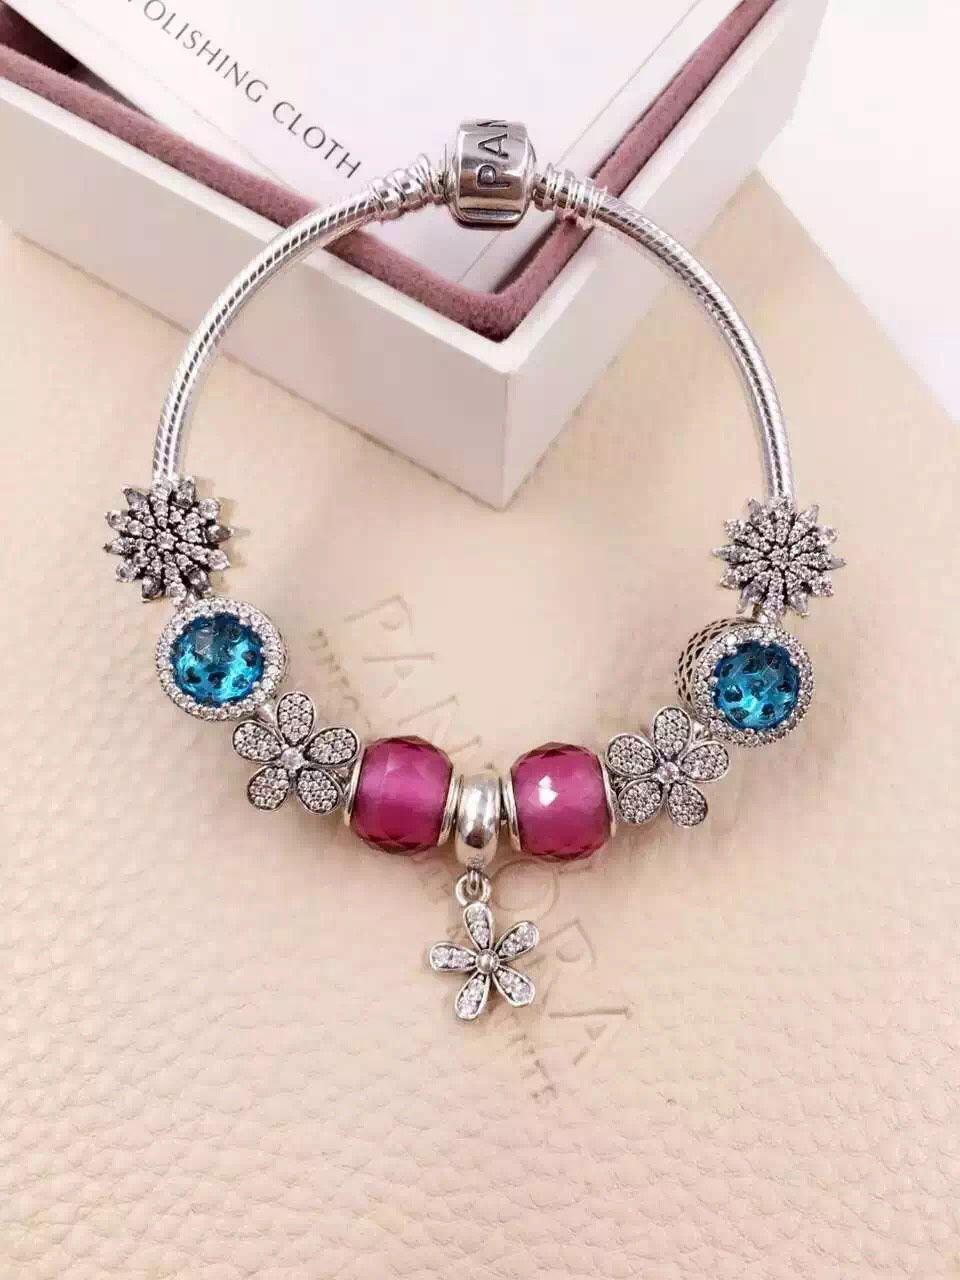 239 pandora charm bracelet pink blue hot sale